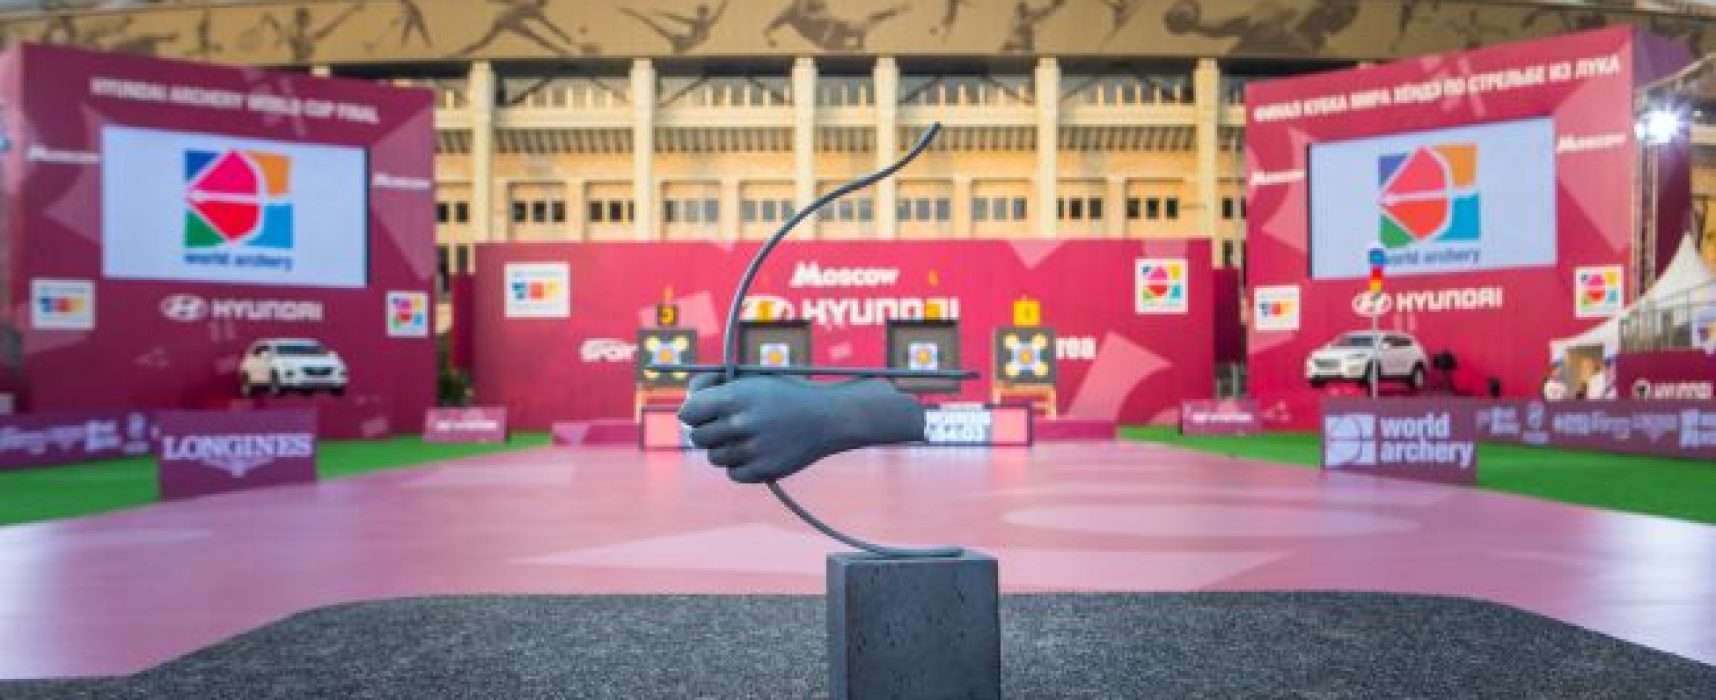 To πρόγραμμα του Hyundai Archery World Cup 2021